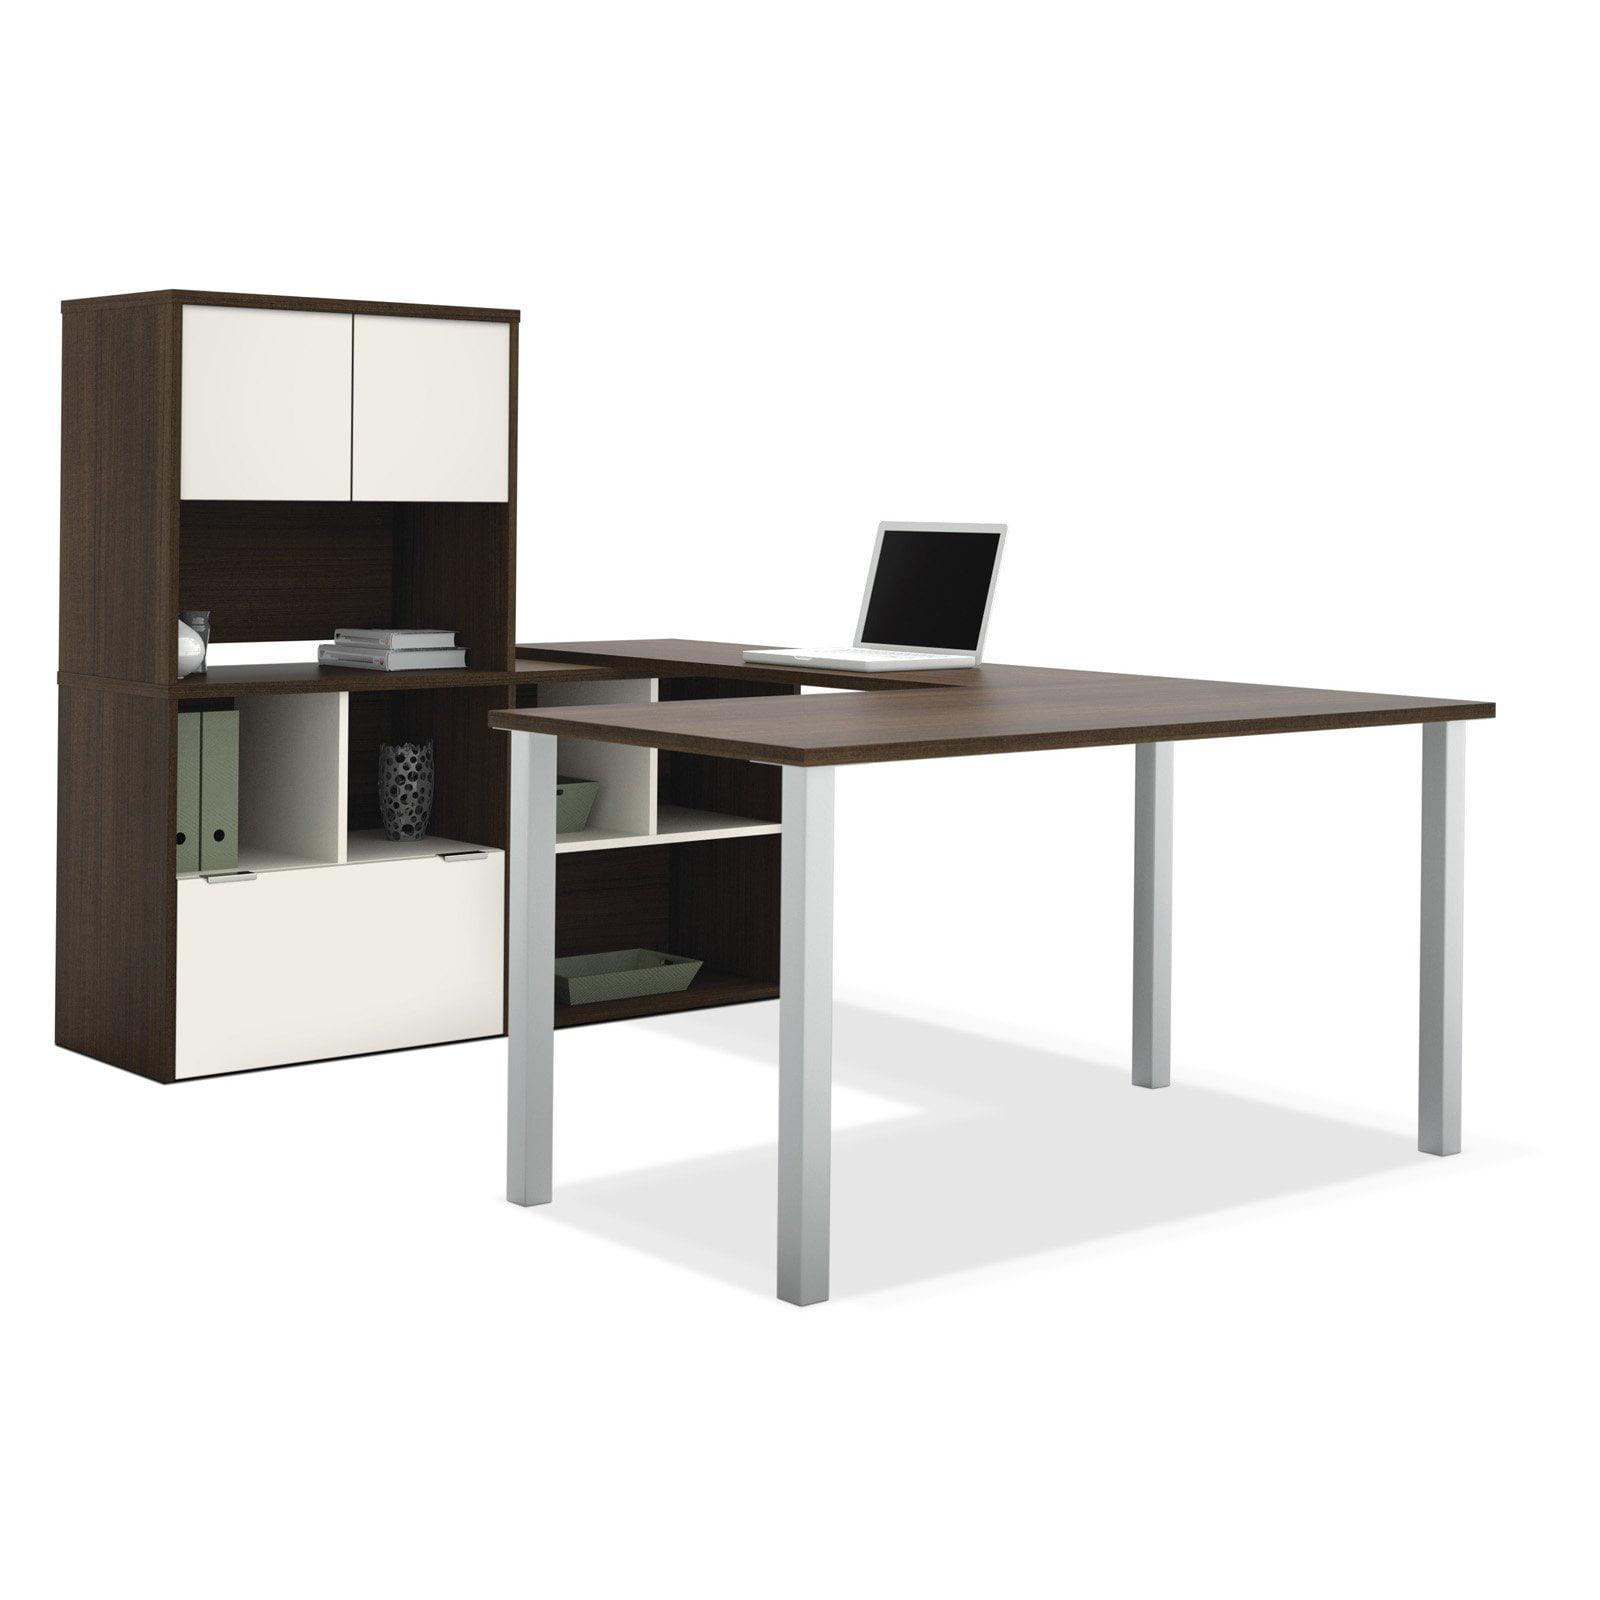 Bestar 50851-60 Contempo U-Shaped Desk with Storage Unit Tuxedo   Sandstone by Bestar